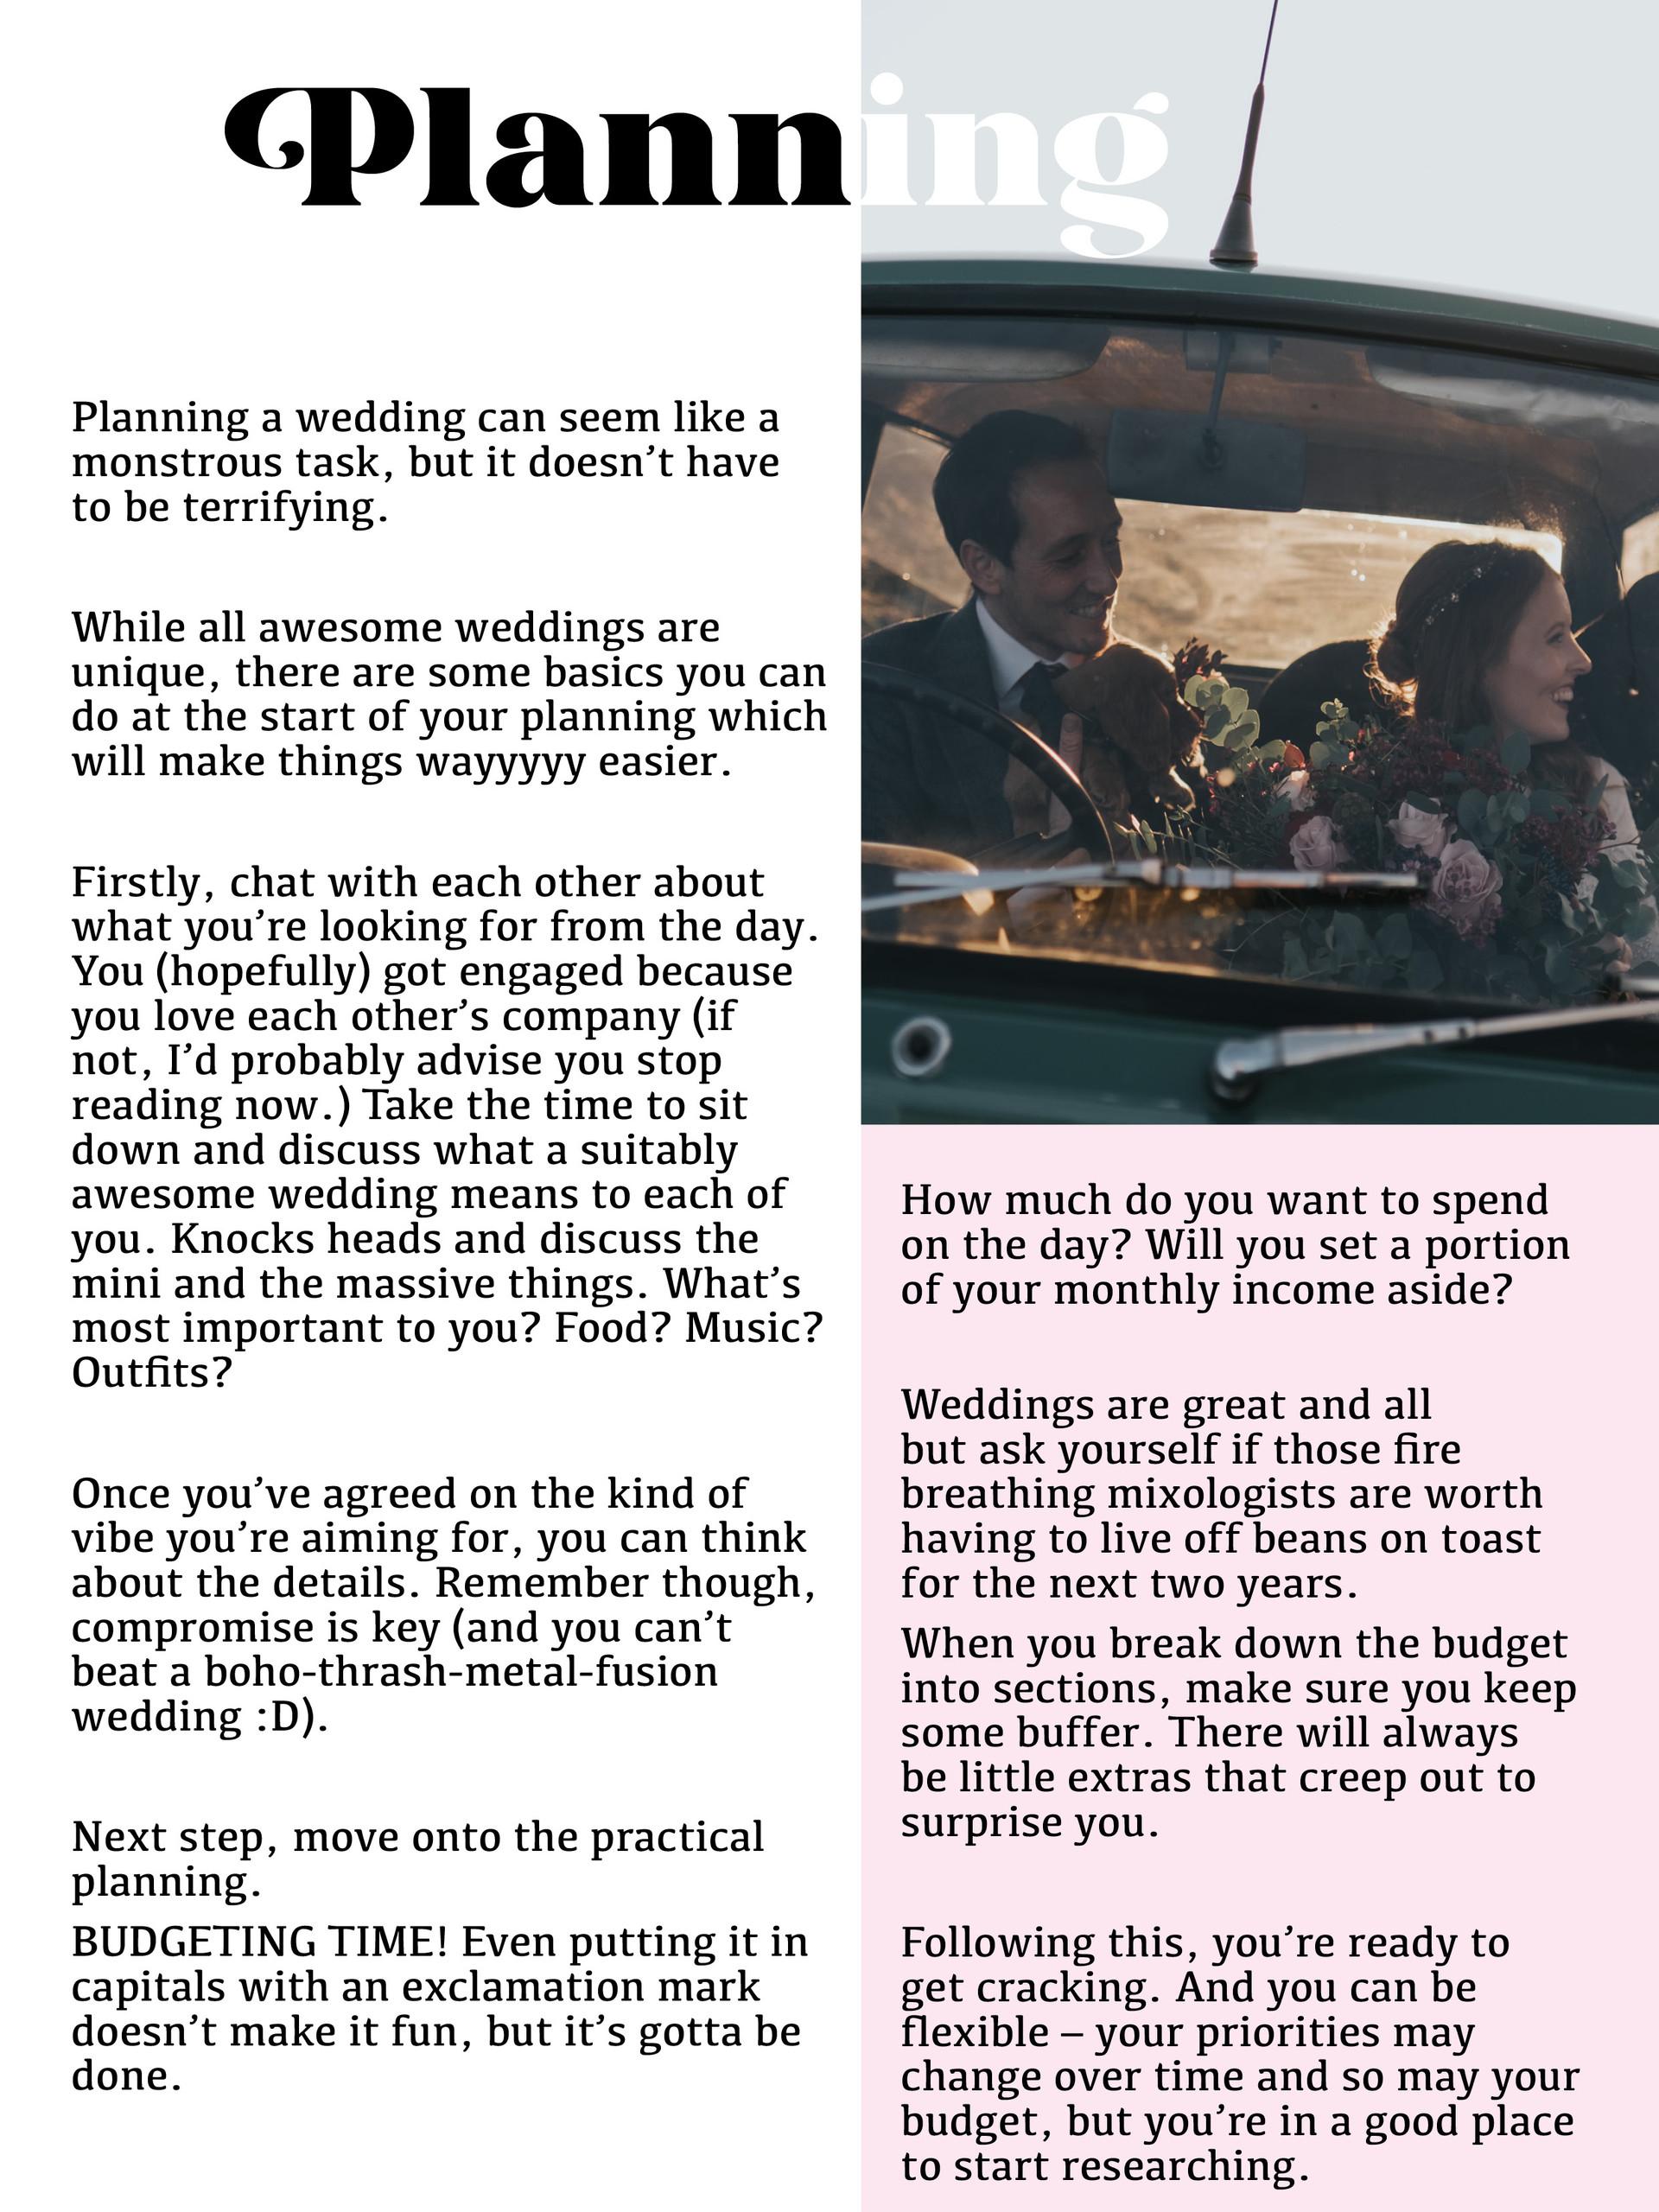 Wedding planning guide3.jpg